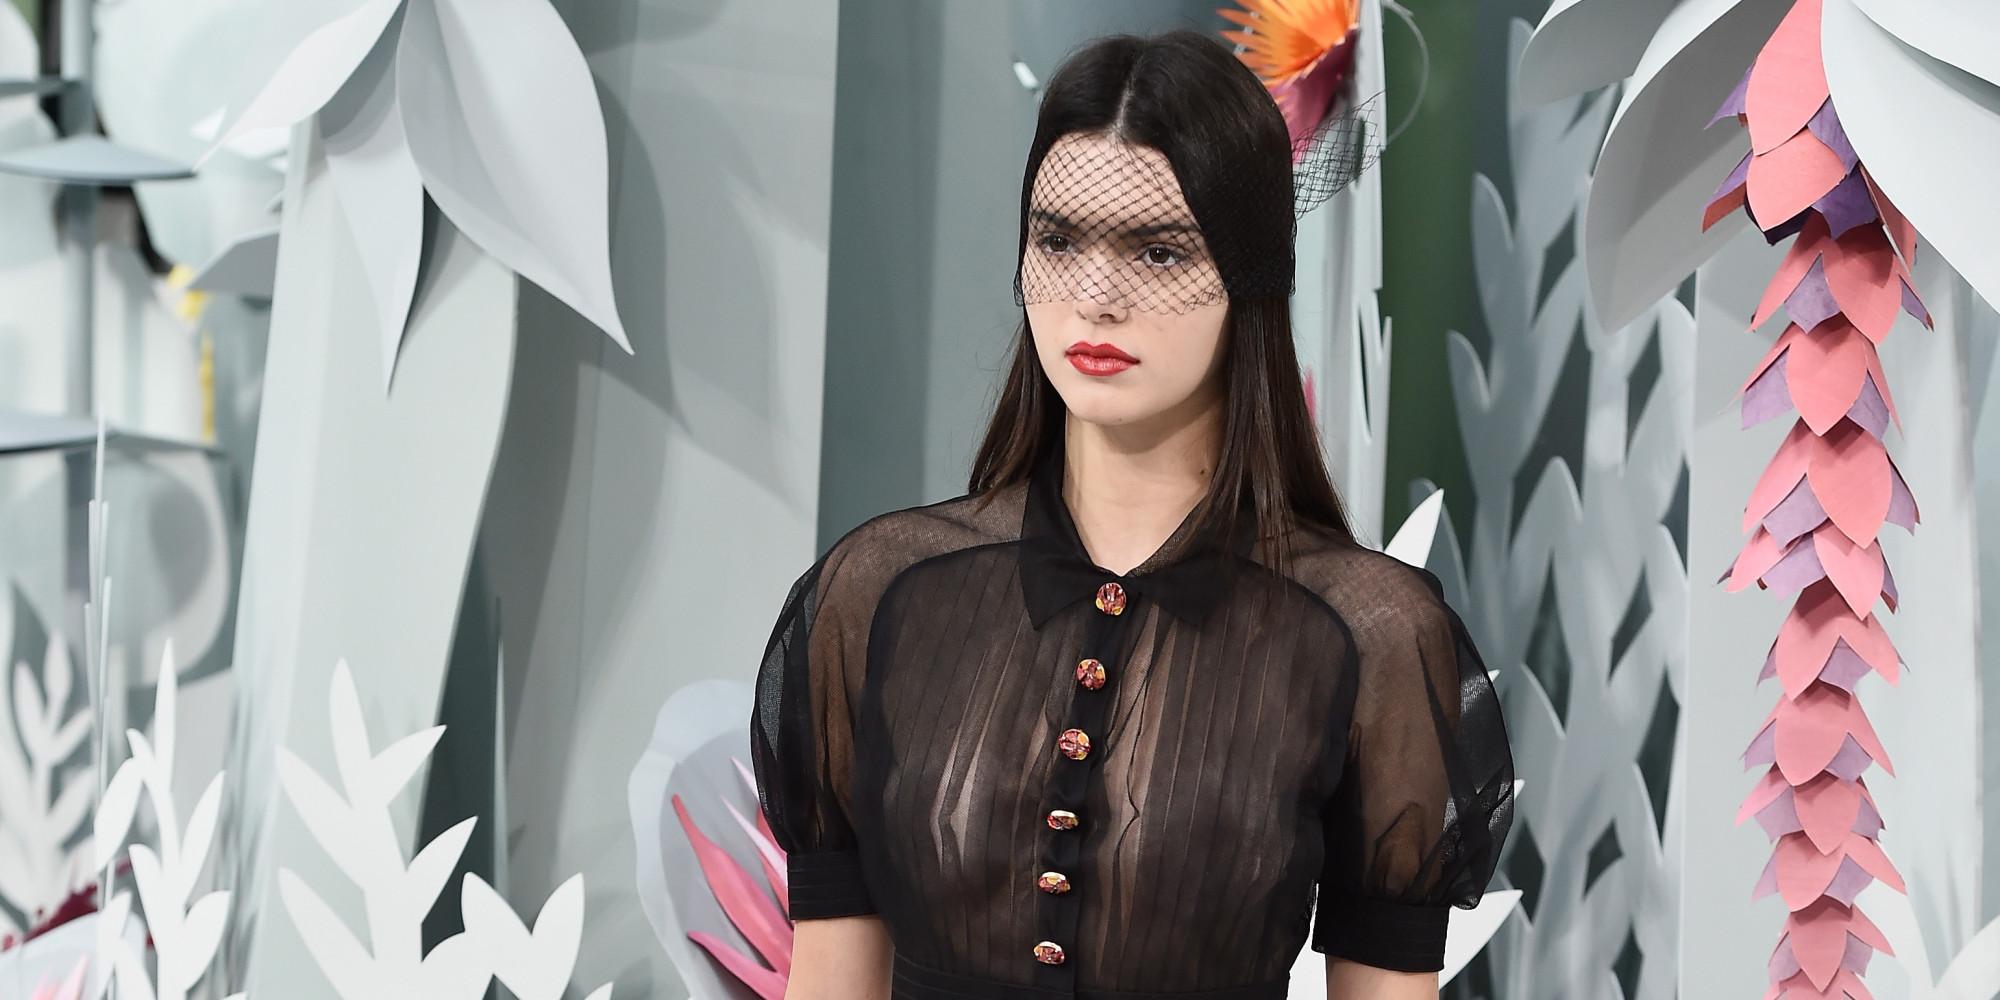 speech on craze for fashion among teens